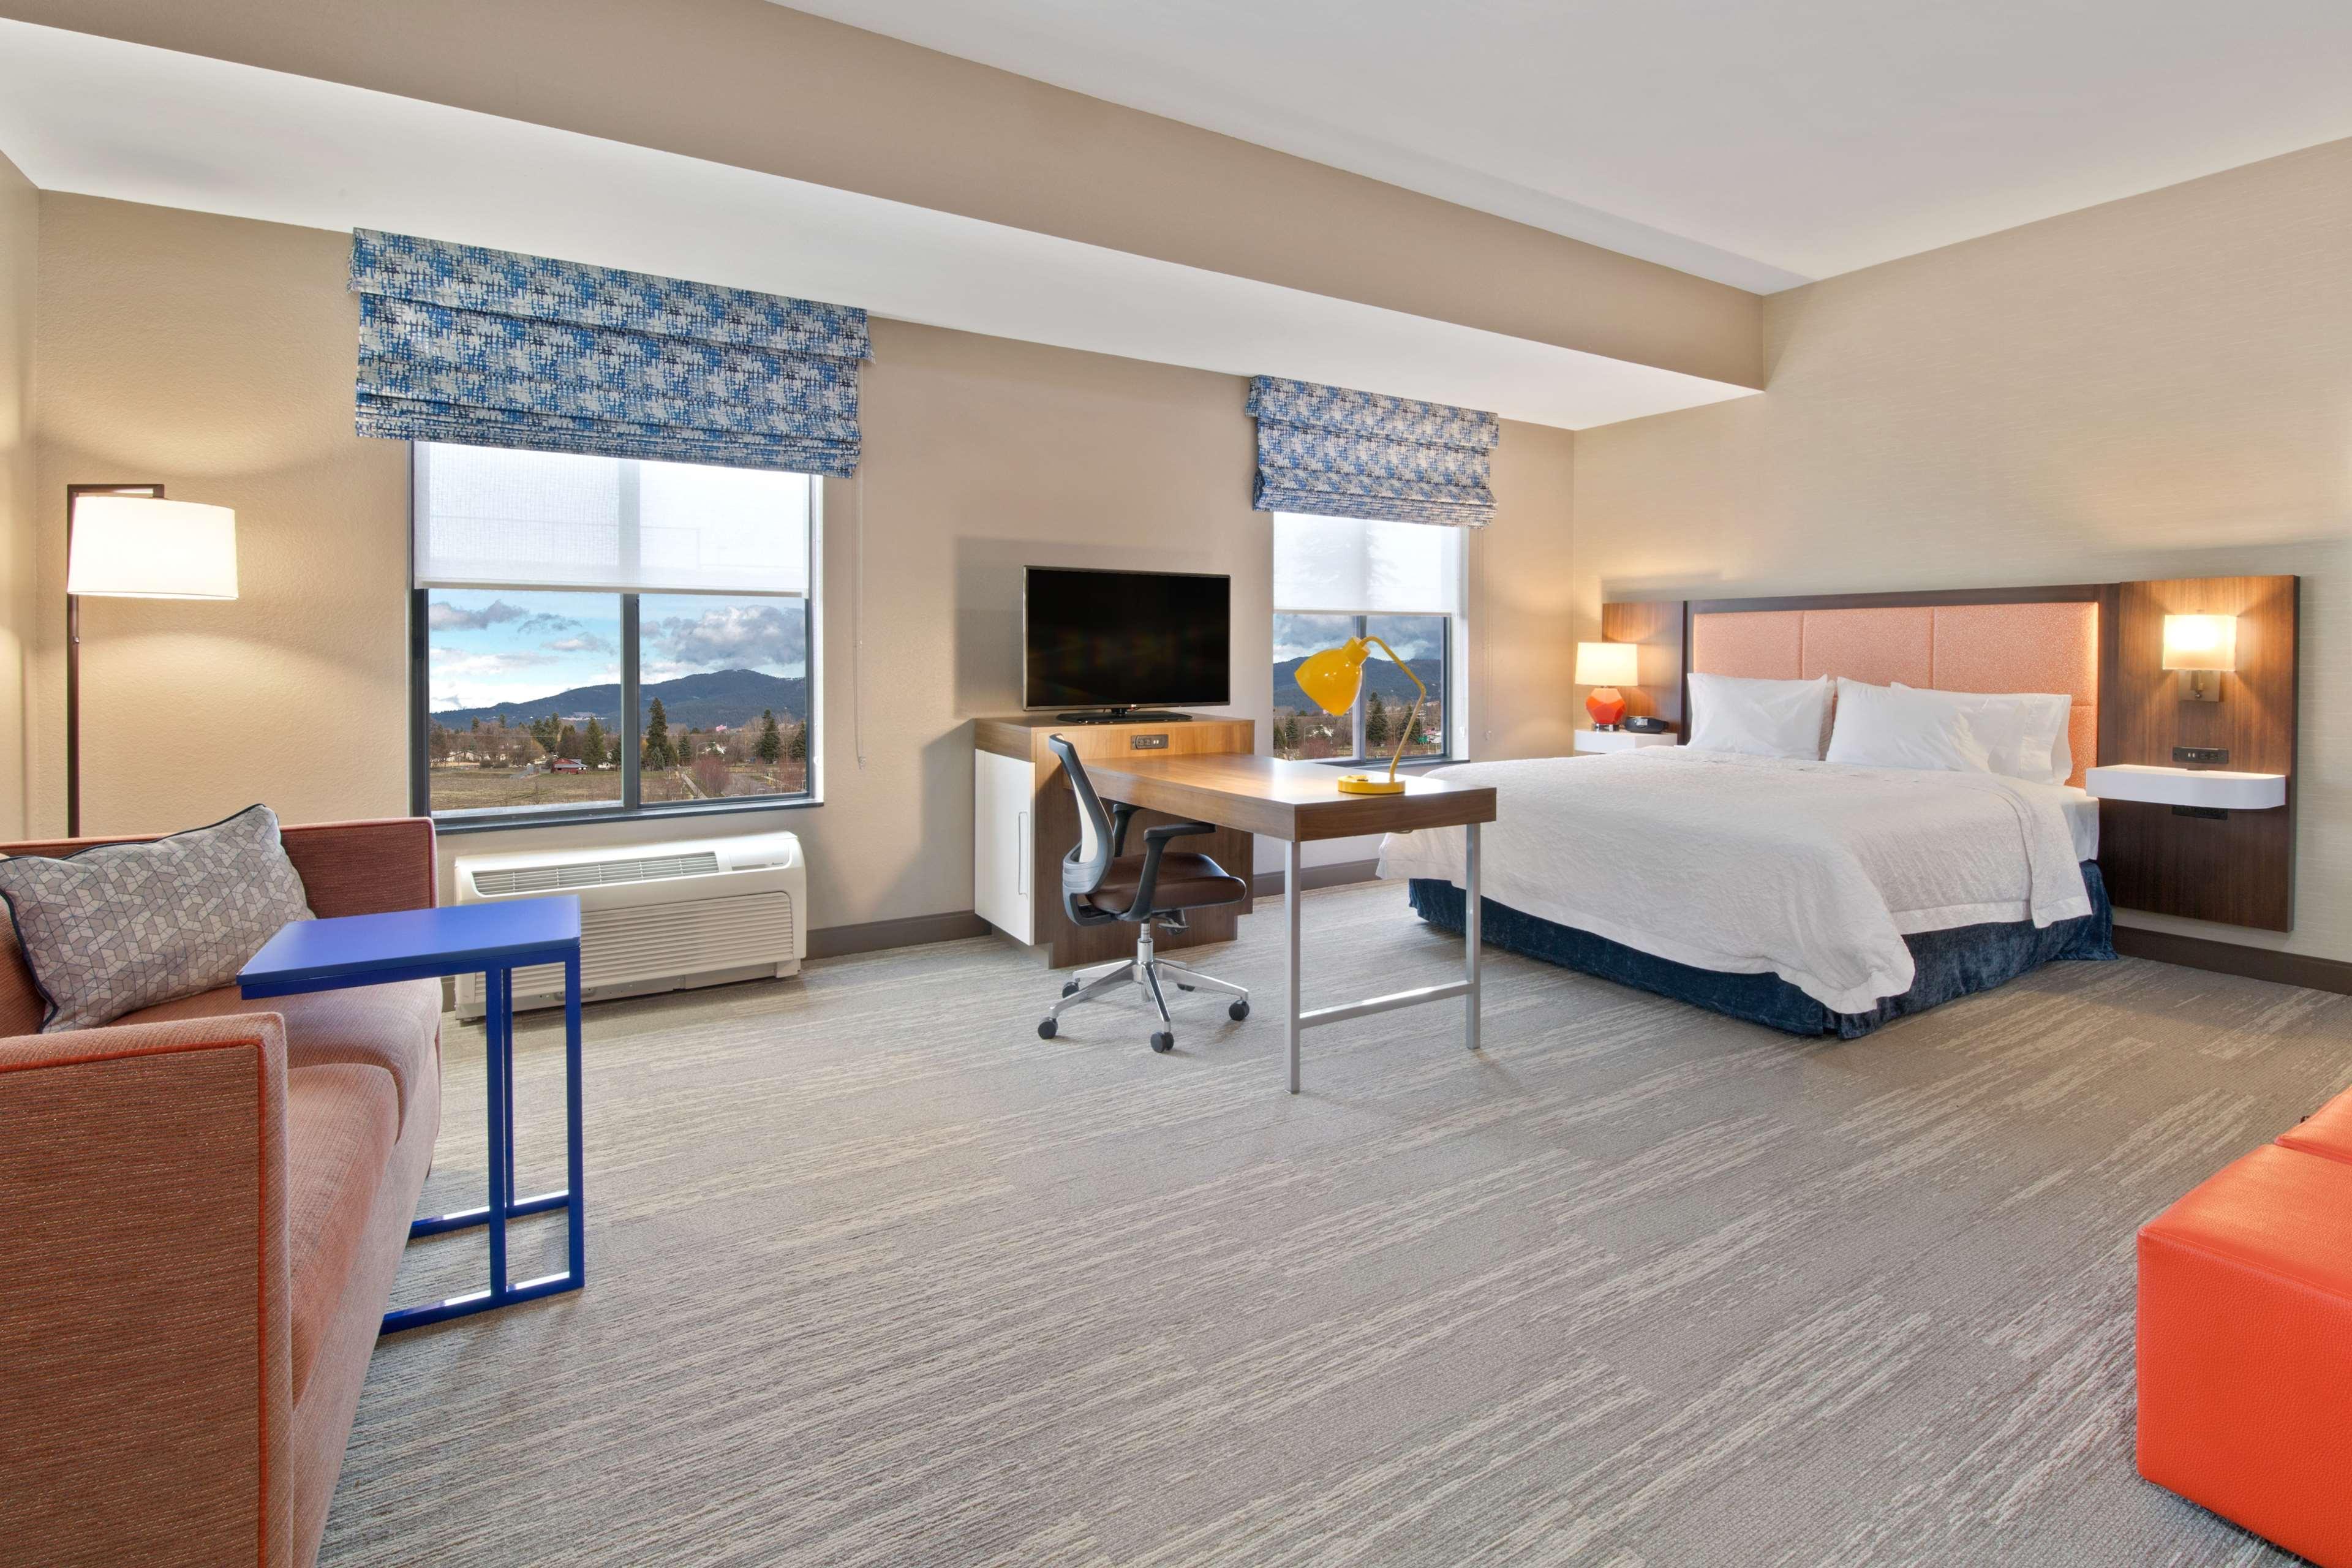 Hampton Inn & Suites Spokane Valley image 20